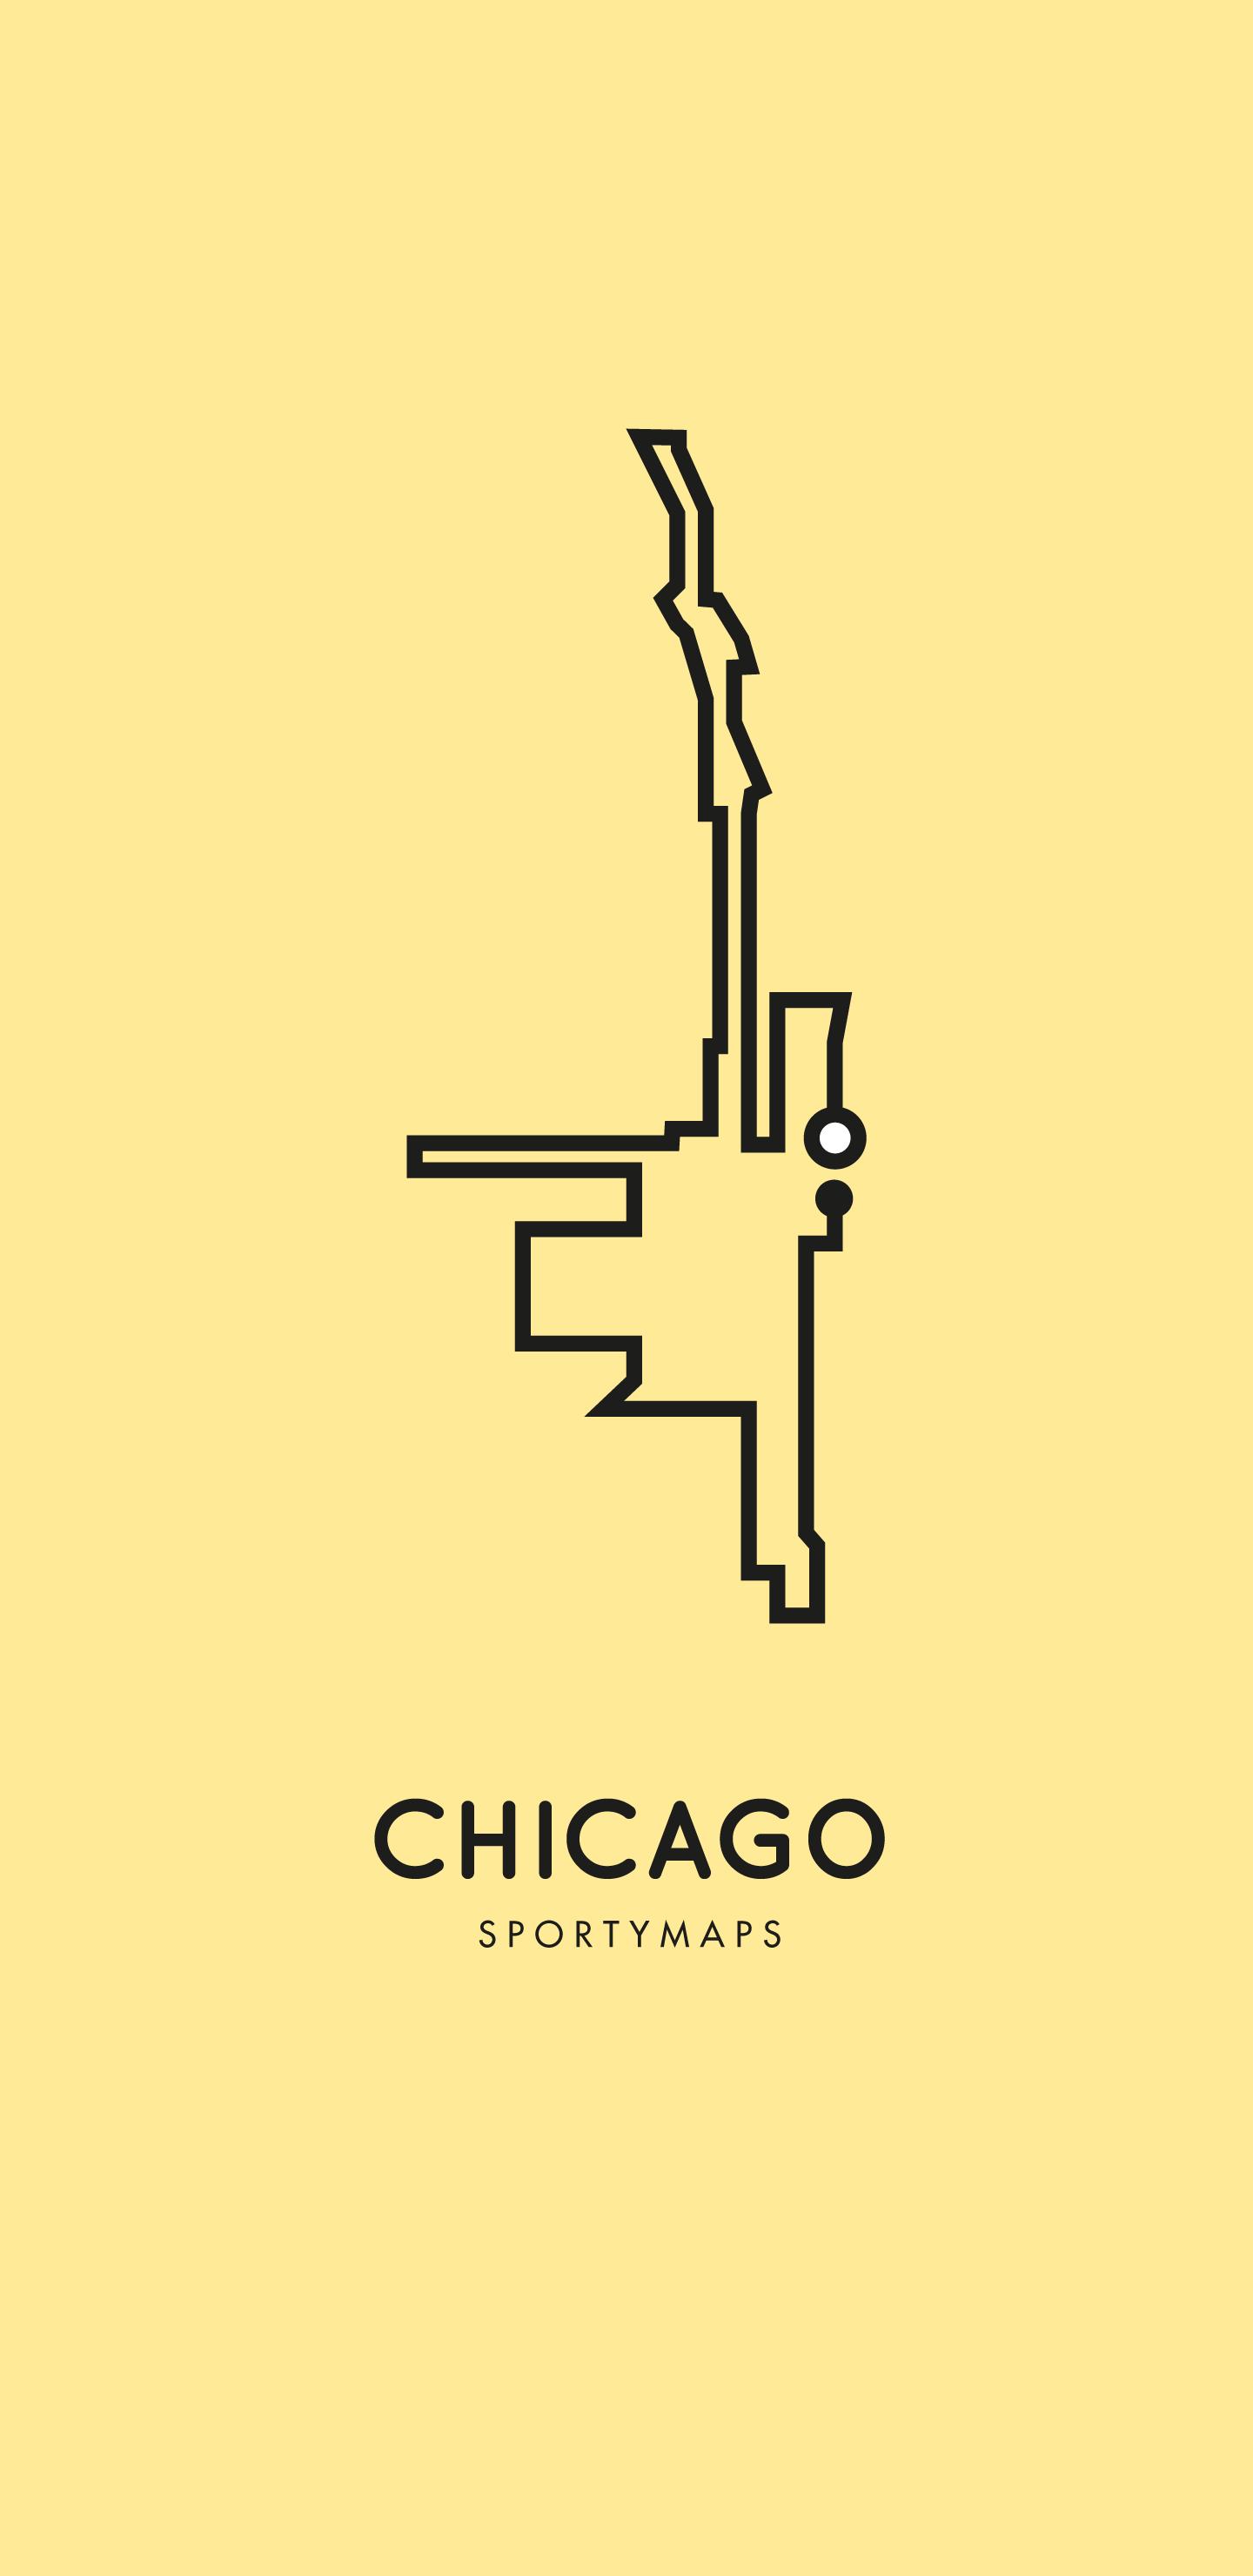 Sportymaps-Chicago-marathon-yellow